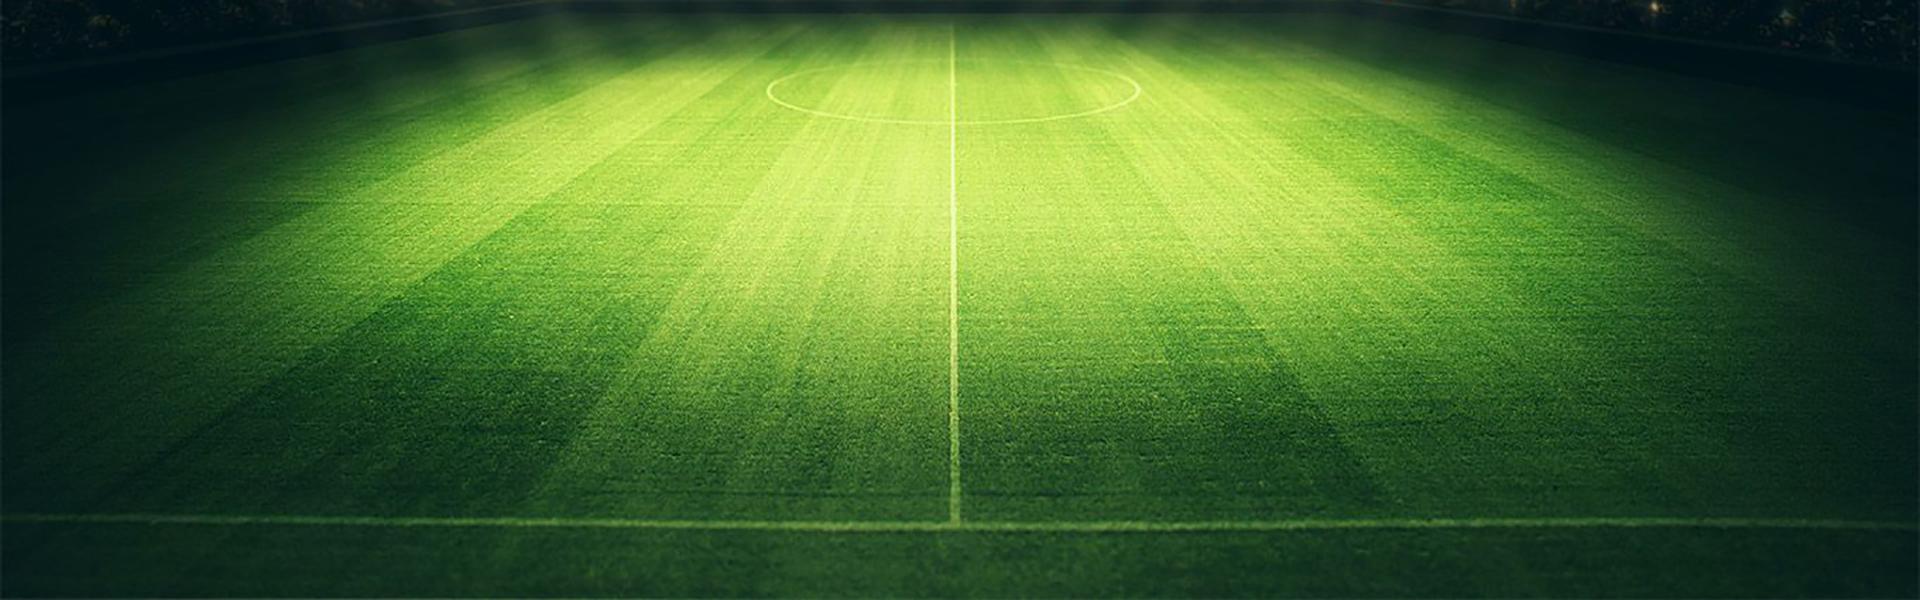 de l u0026 39 herbe laser pelouse dispositif contexte plante stade de football le printemps image de fond